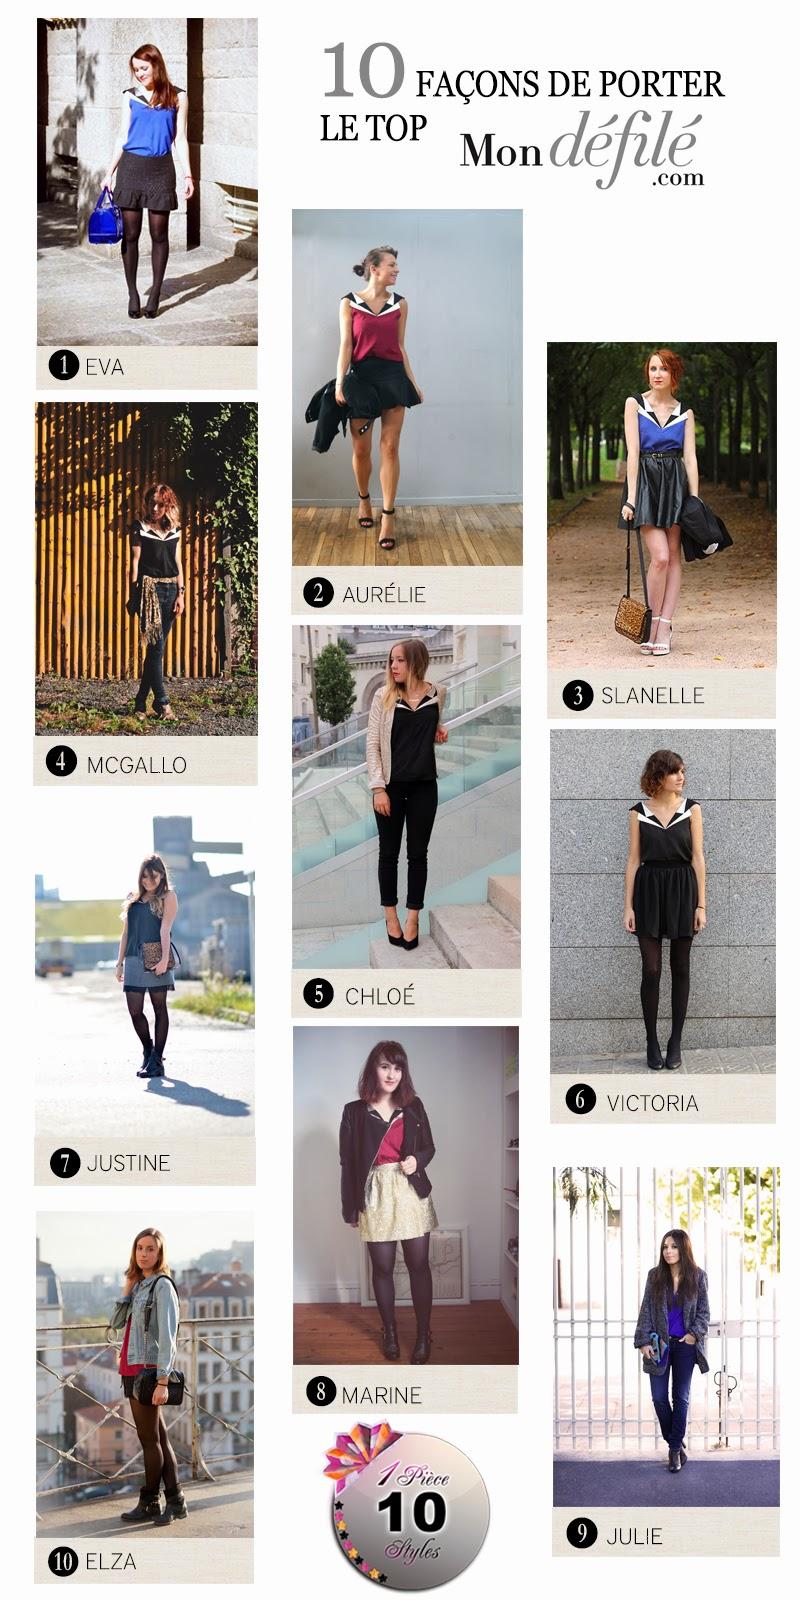 10 façons de porter le top cuir